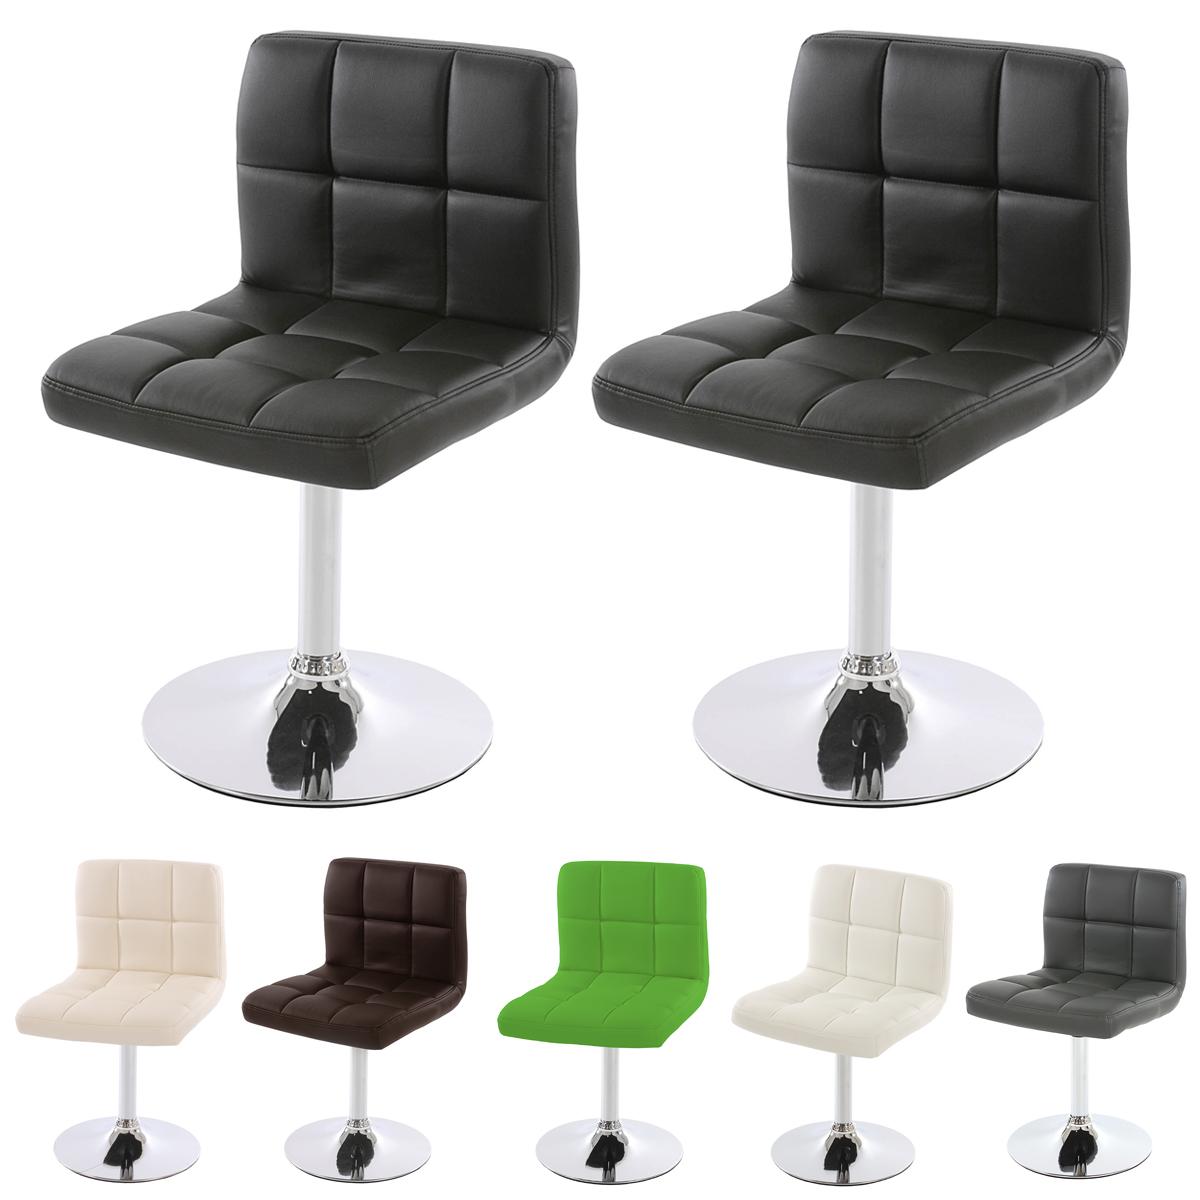 2x esszimmerstuhl drehstuhl kavala kunstleder schwarz creme wei grau braun ebay. Black Bedroom Furniture Sets. Home Design Ideas